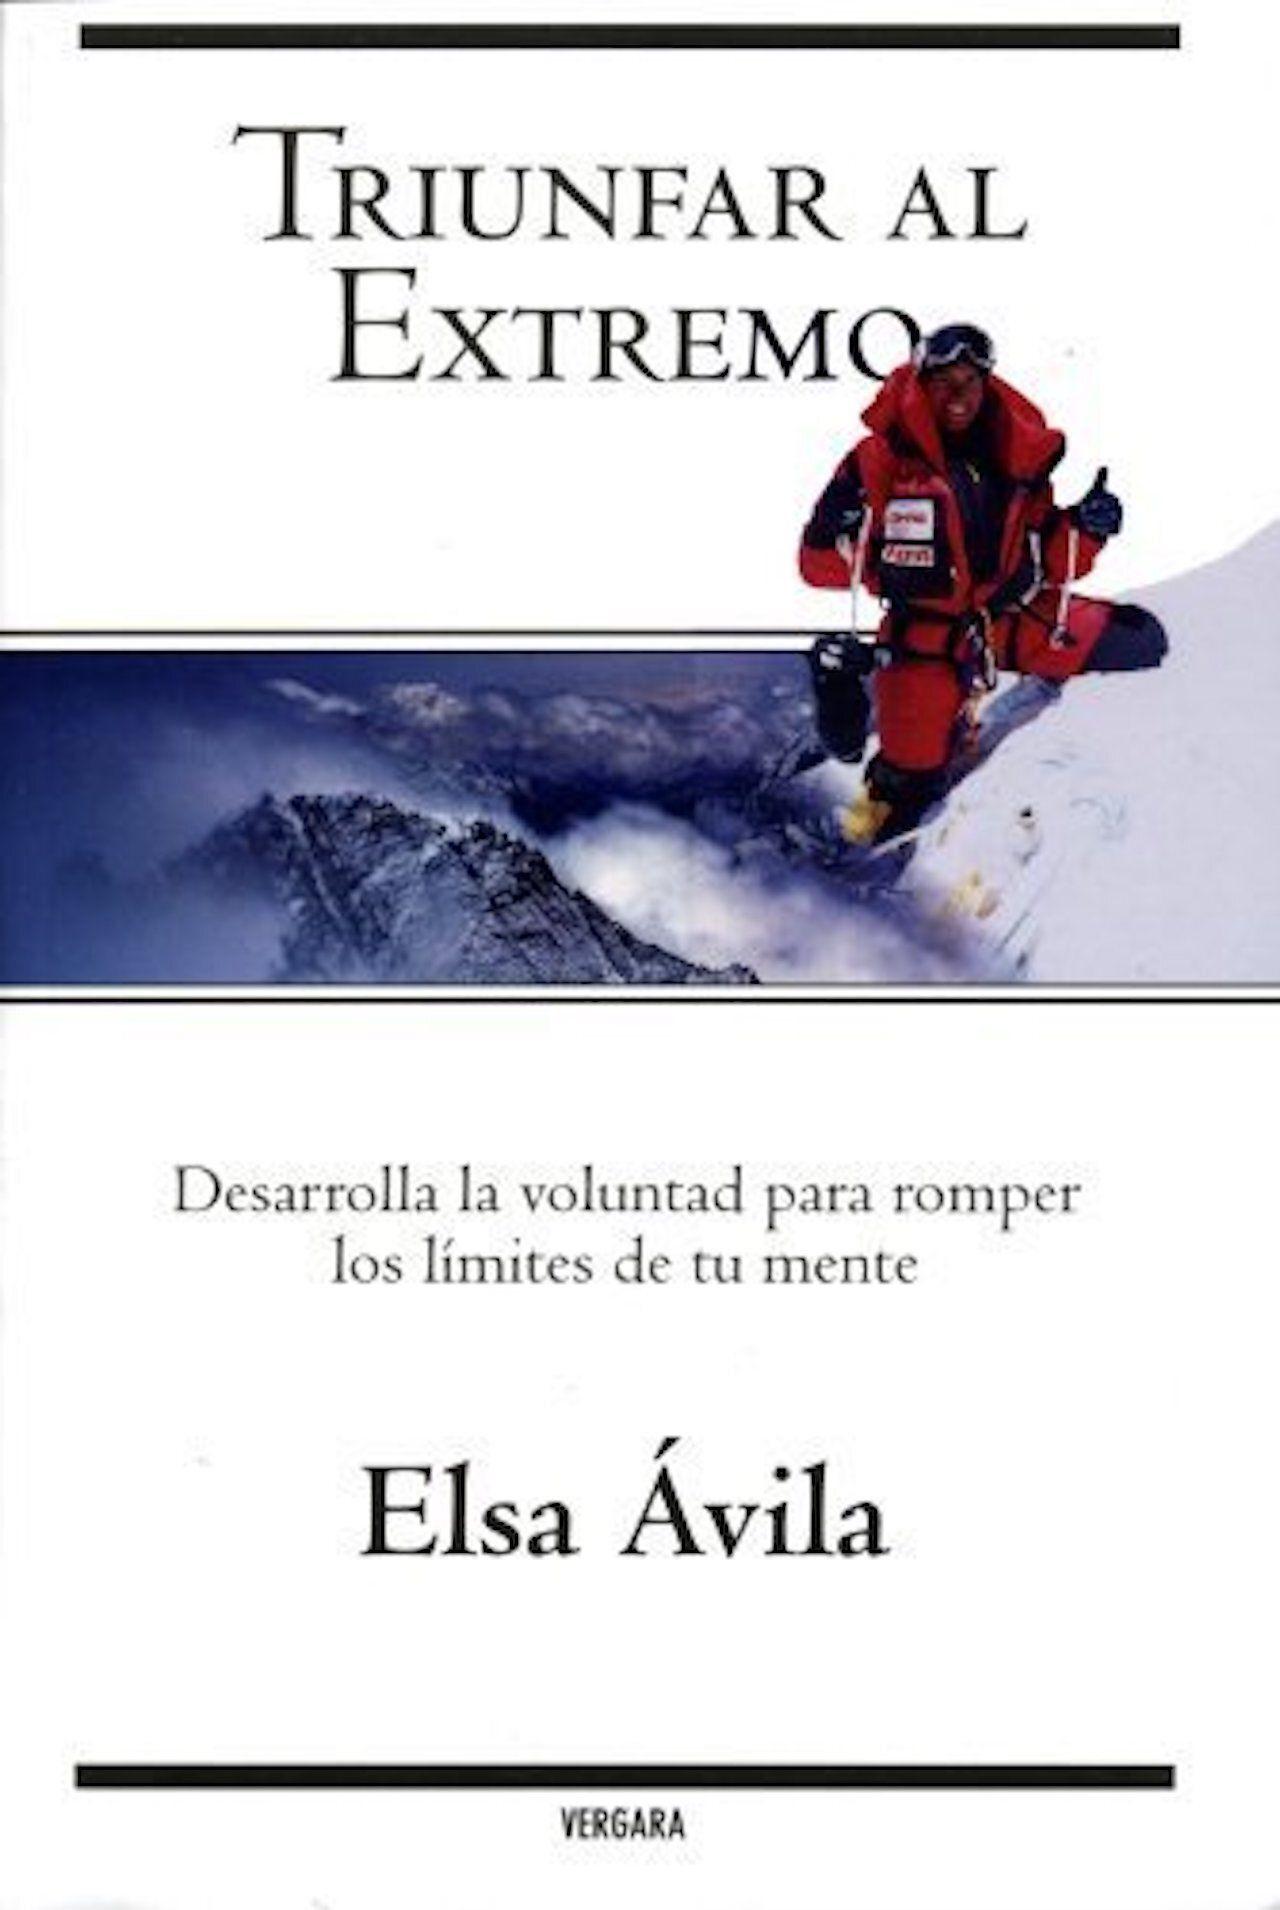 Triunfar al Extremo travel books written by women